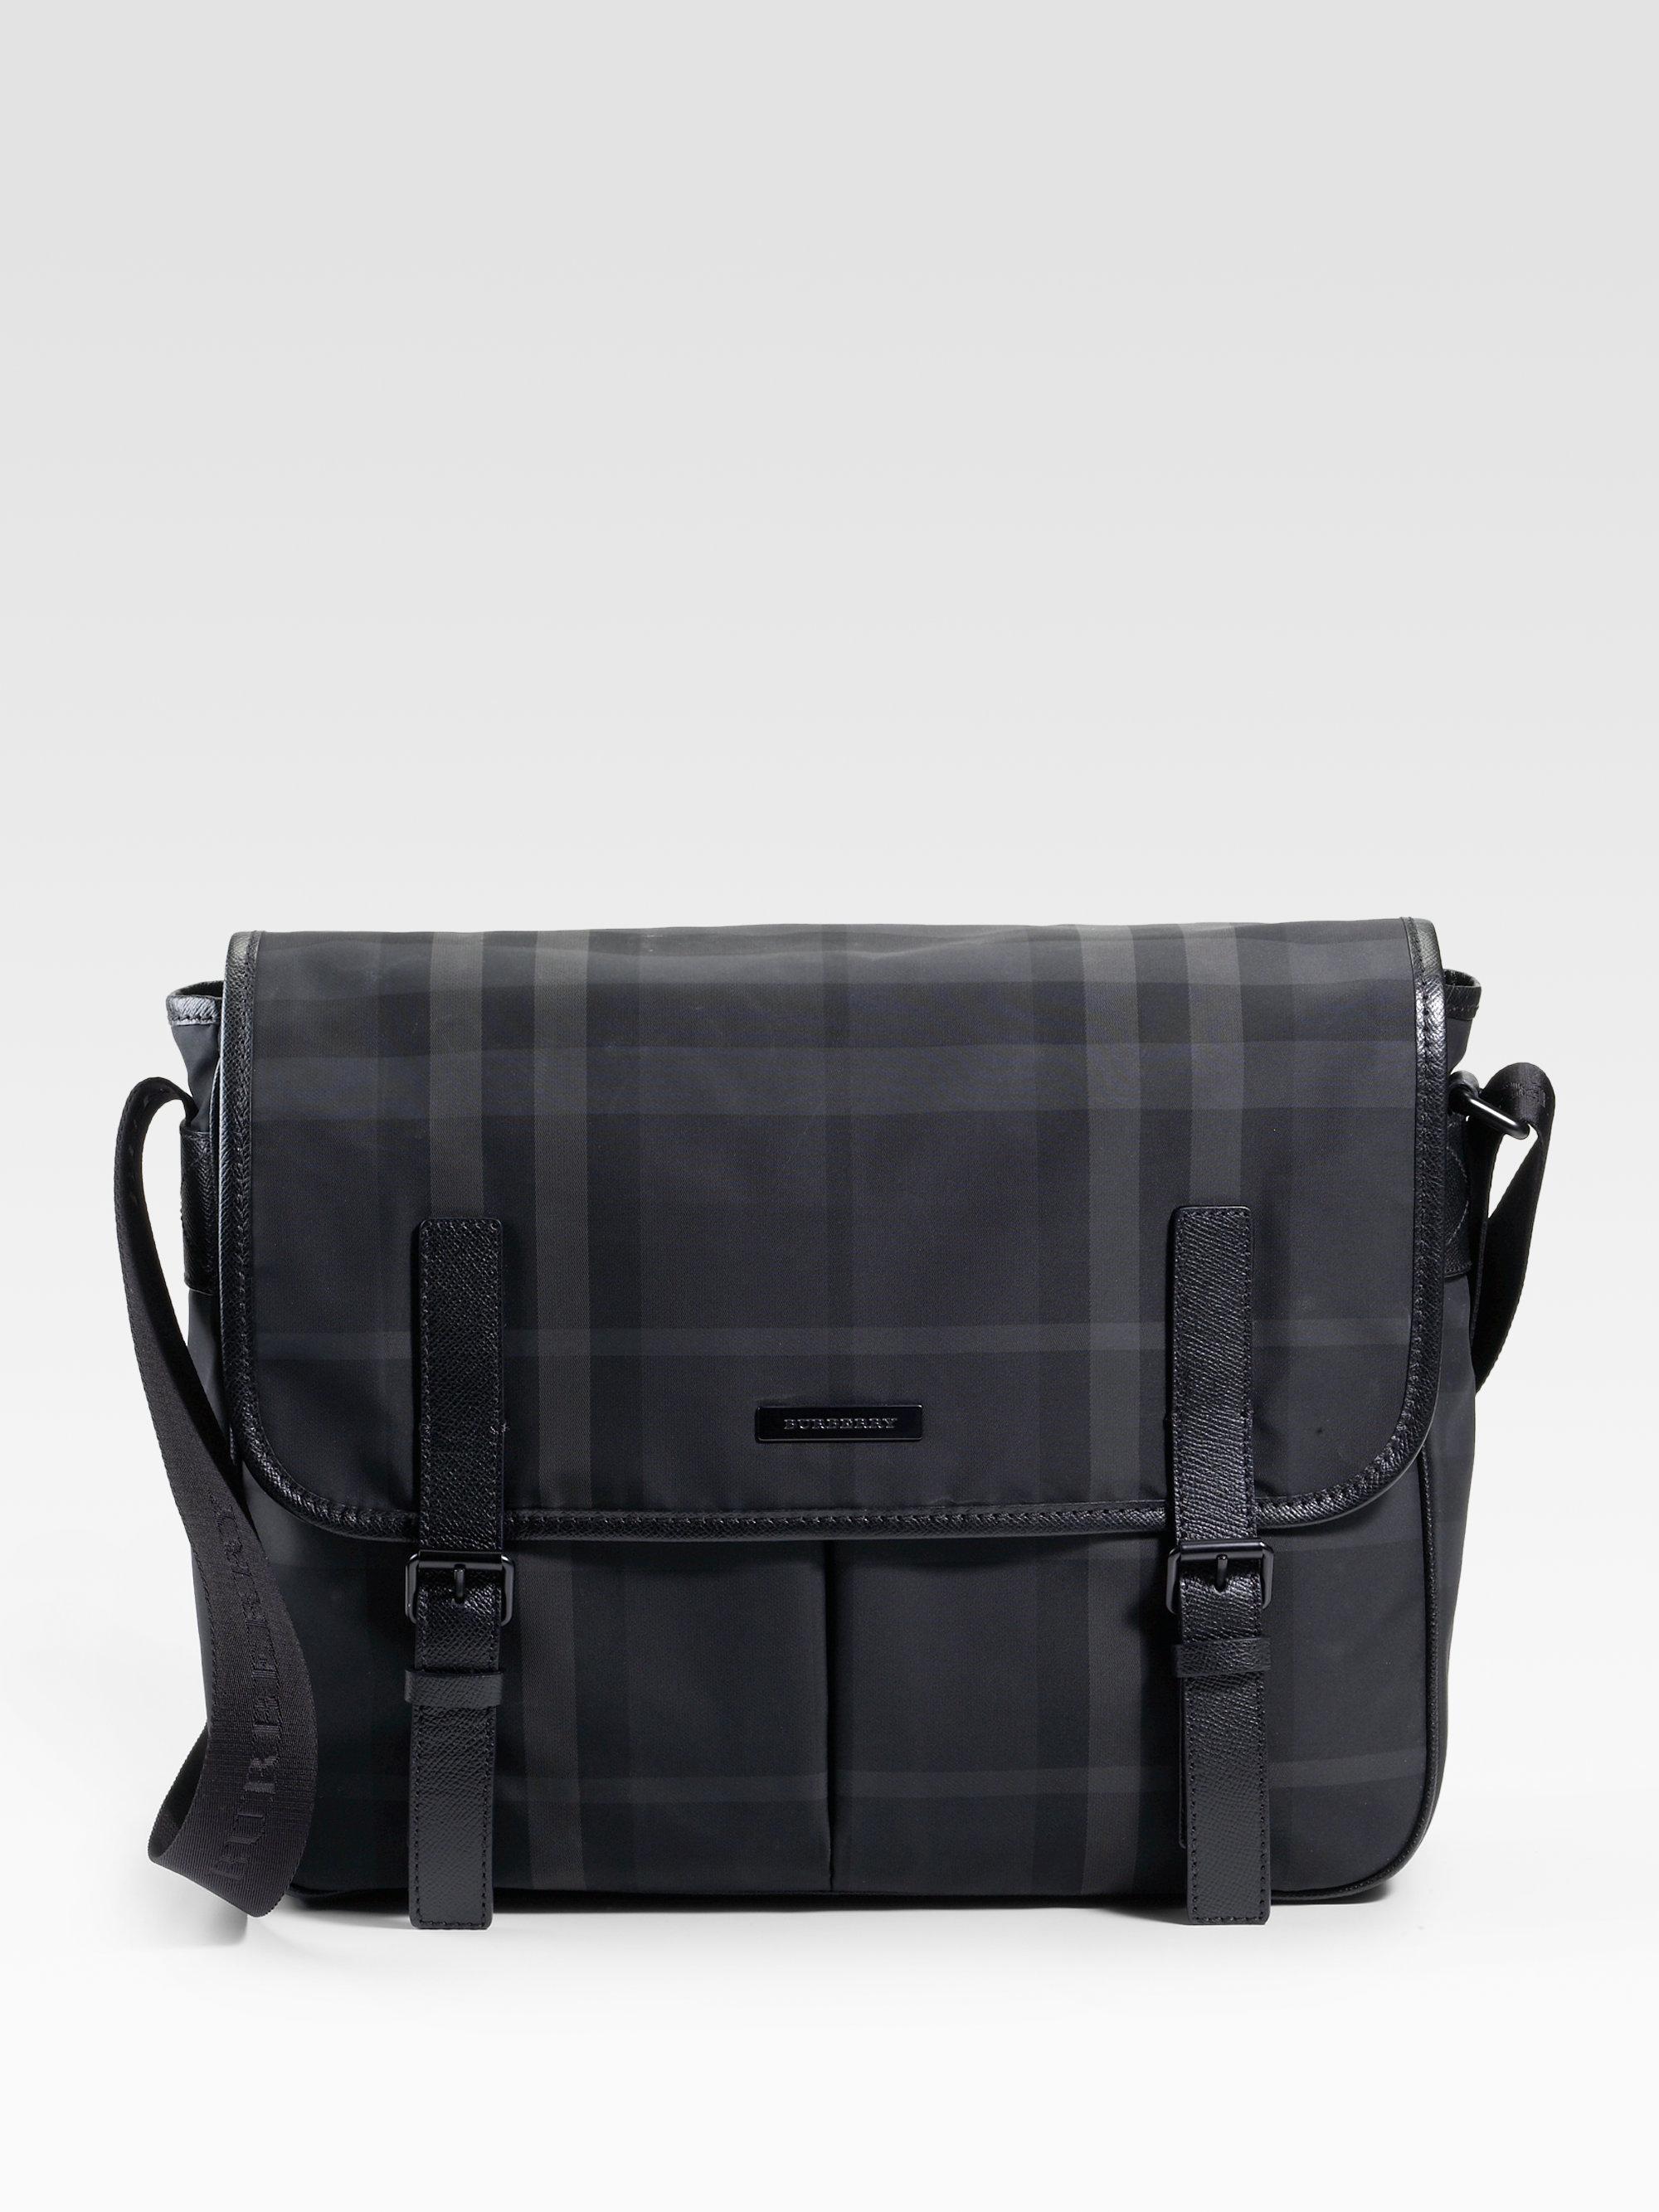 Lyst - Burberry Beat Check Nylon Messenger Bag in Black for Men a13a19800522e